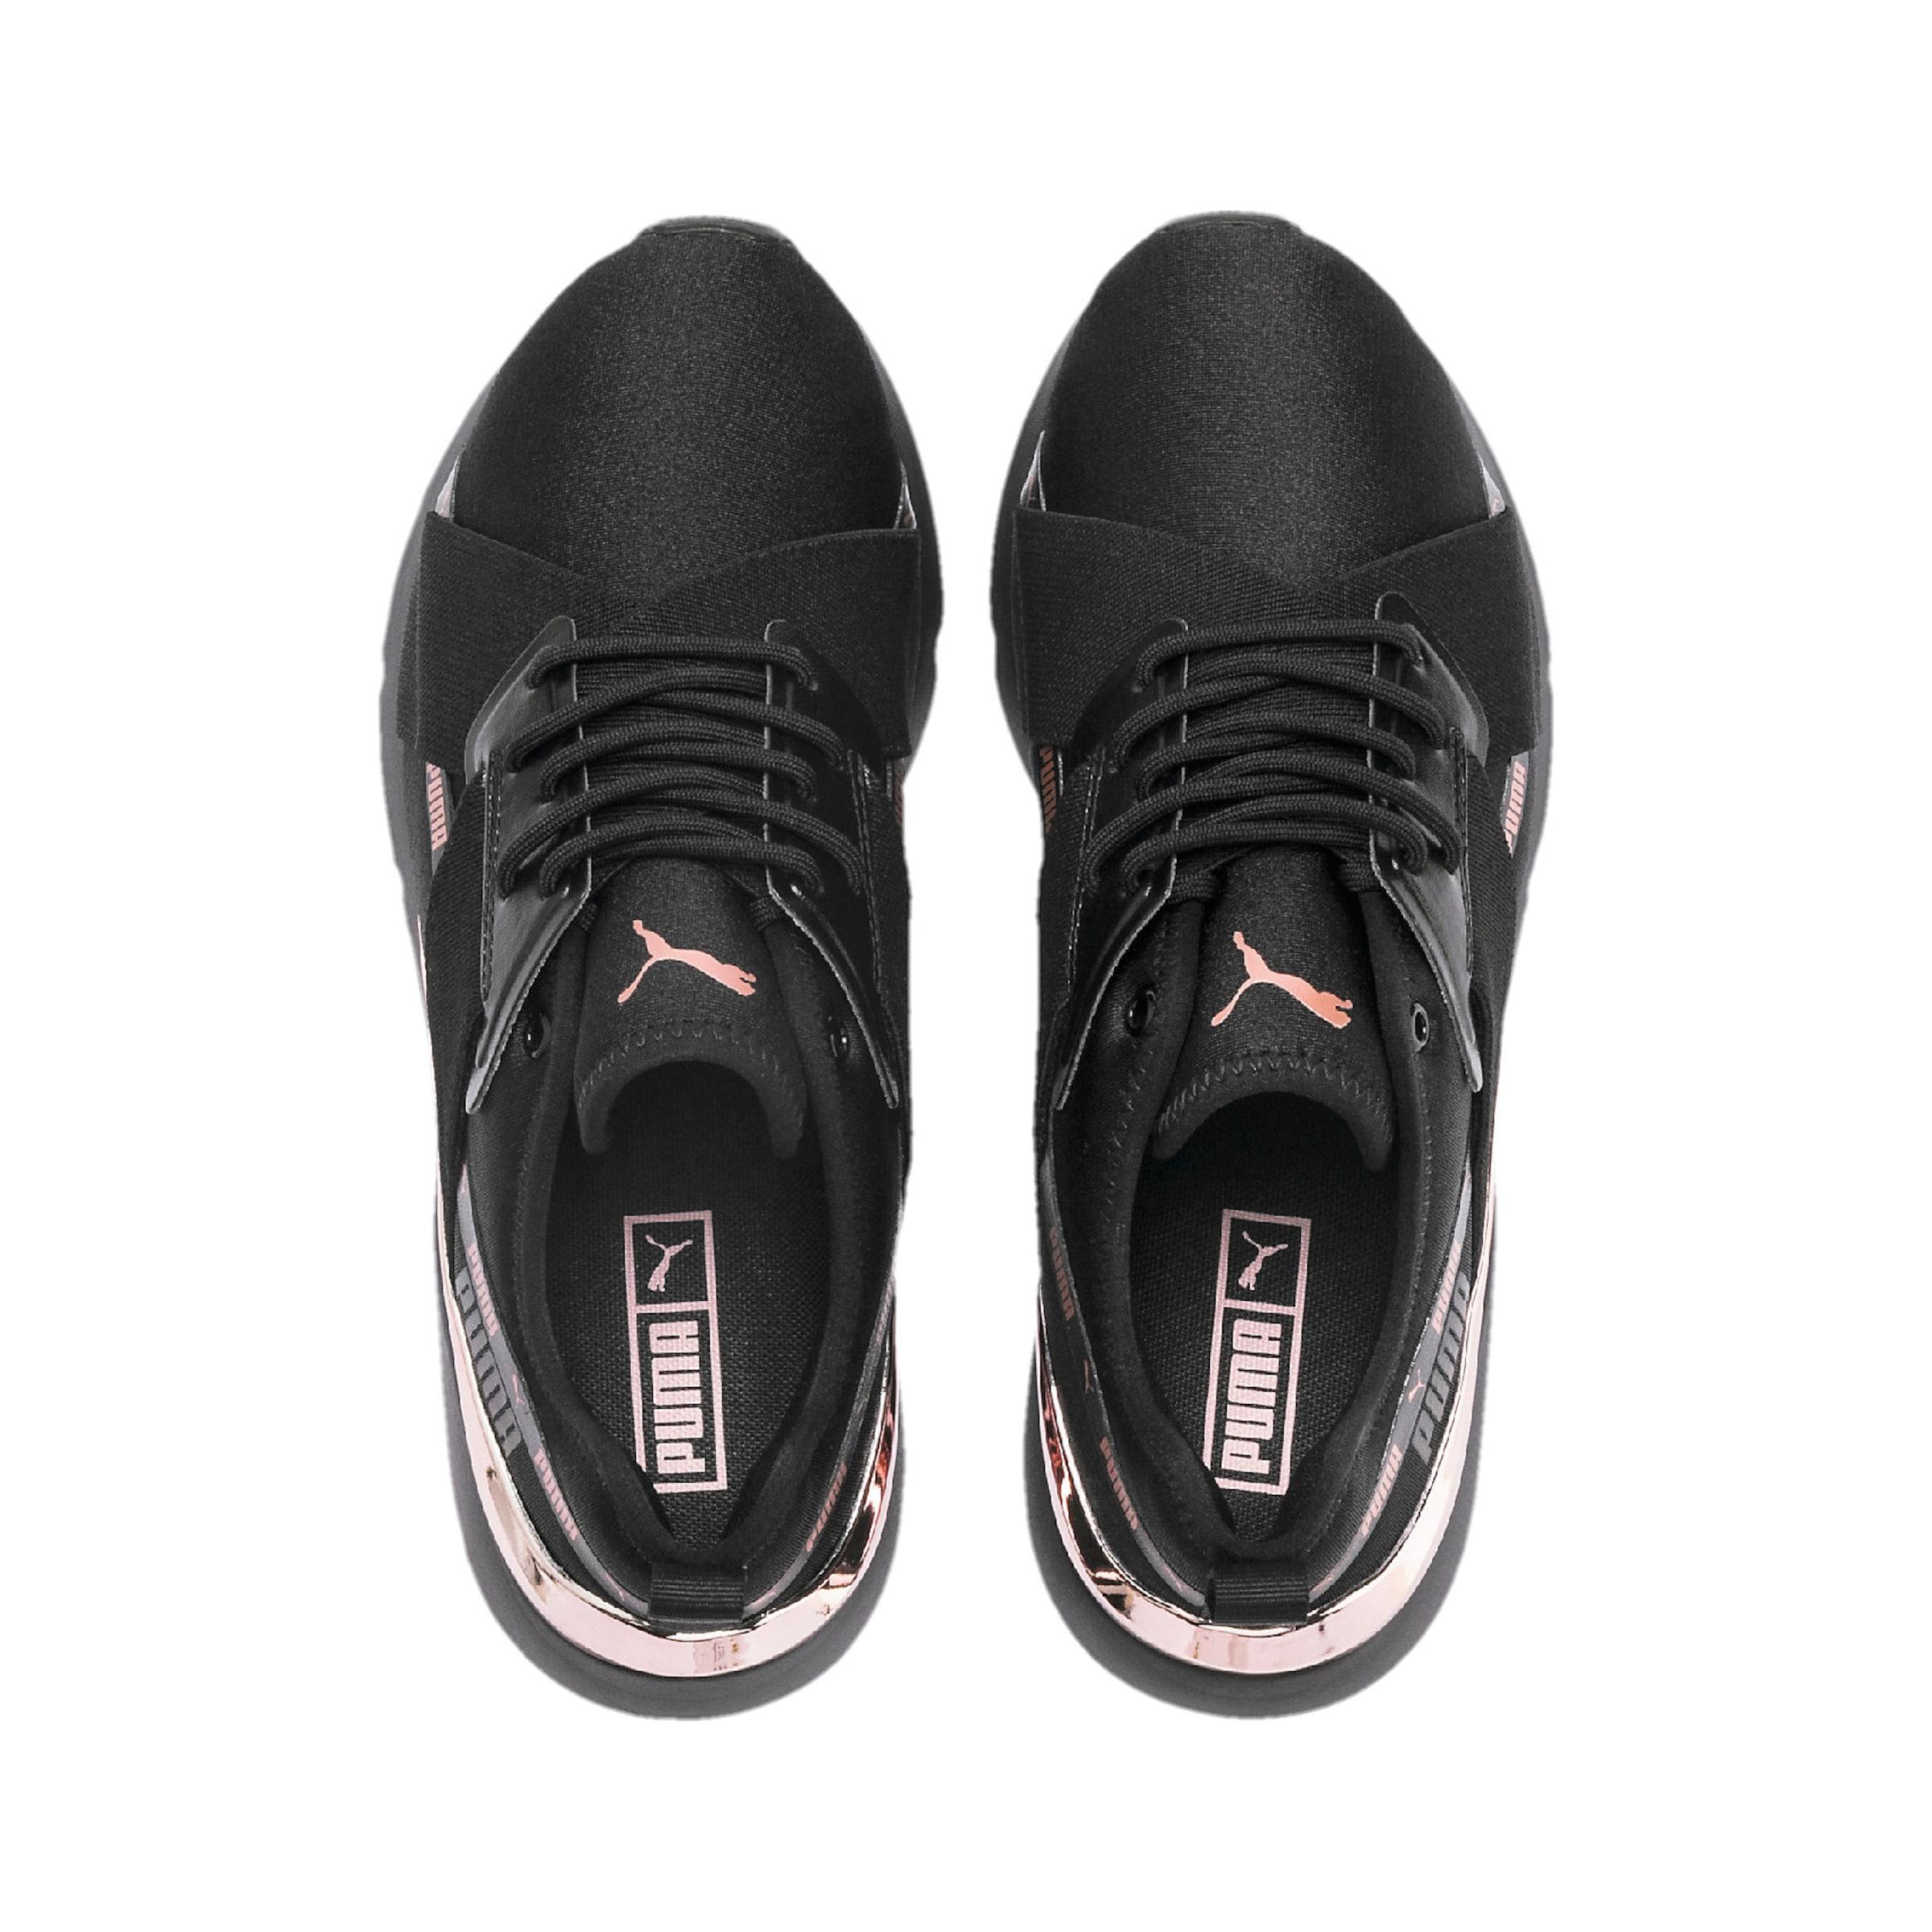 Sneakers X In Puma 2' 'muse RosegoldSchwarz CBrdexoW